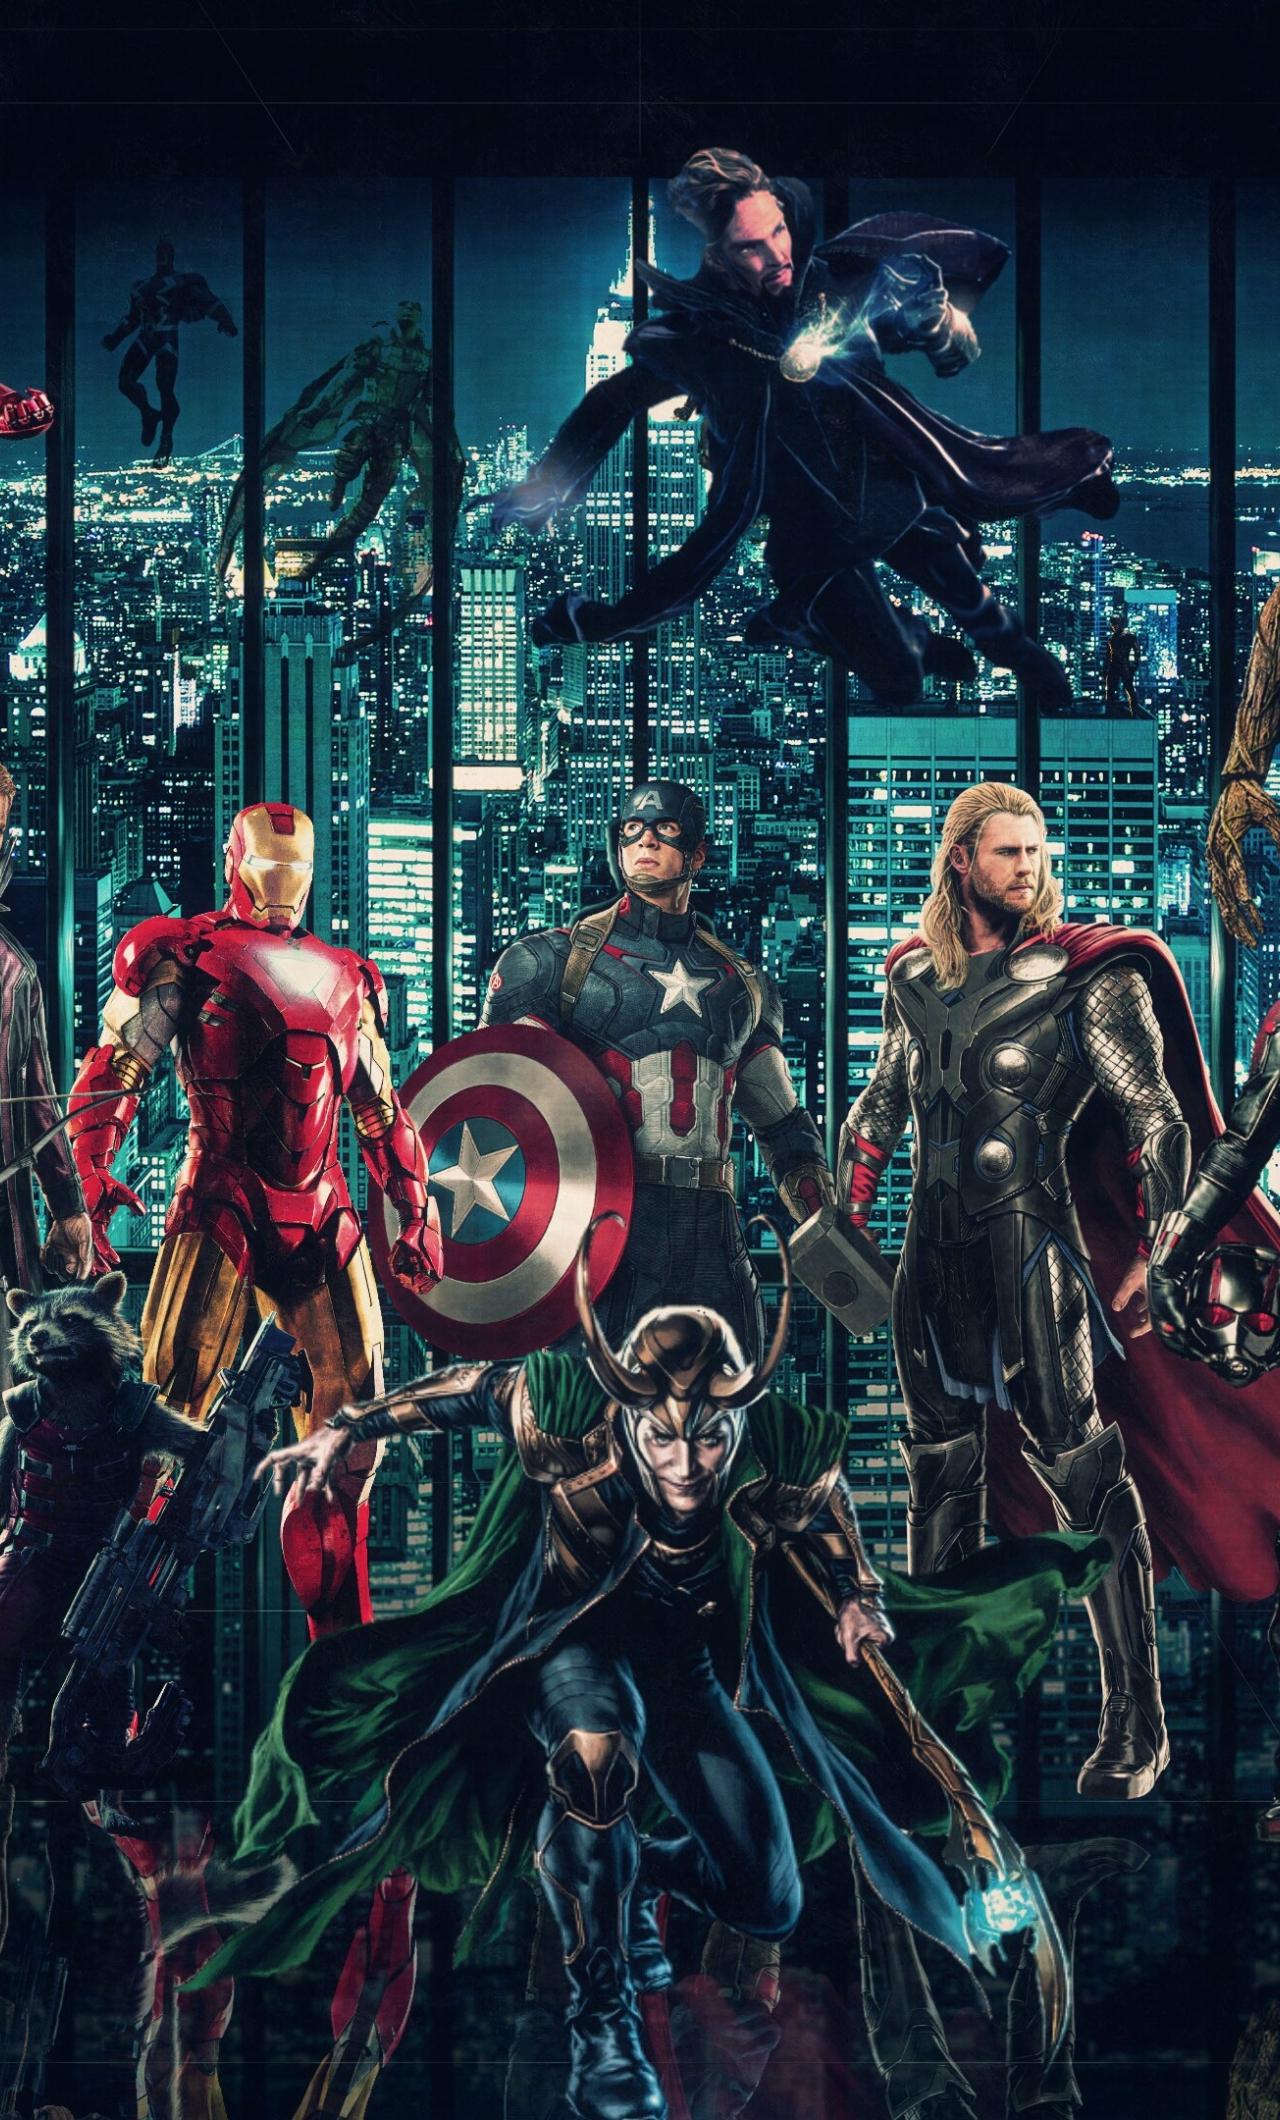 Avengers infinty war superheroes 2018 hd 4k wallpaper - Avengers superhero wallpaper ...